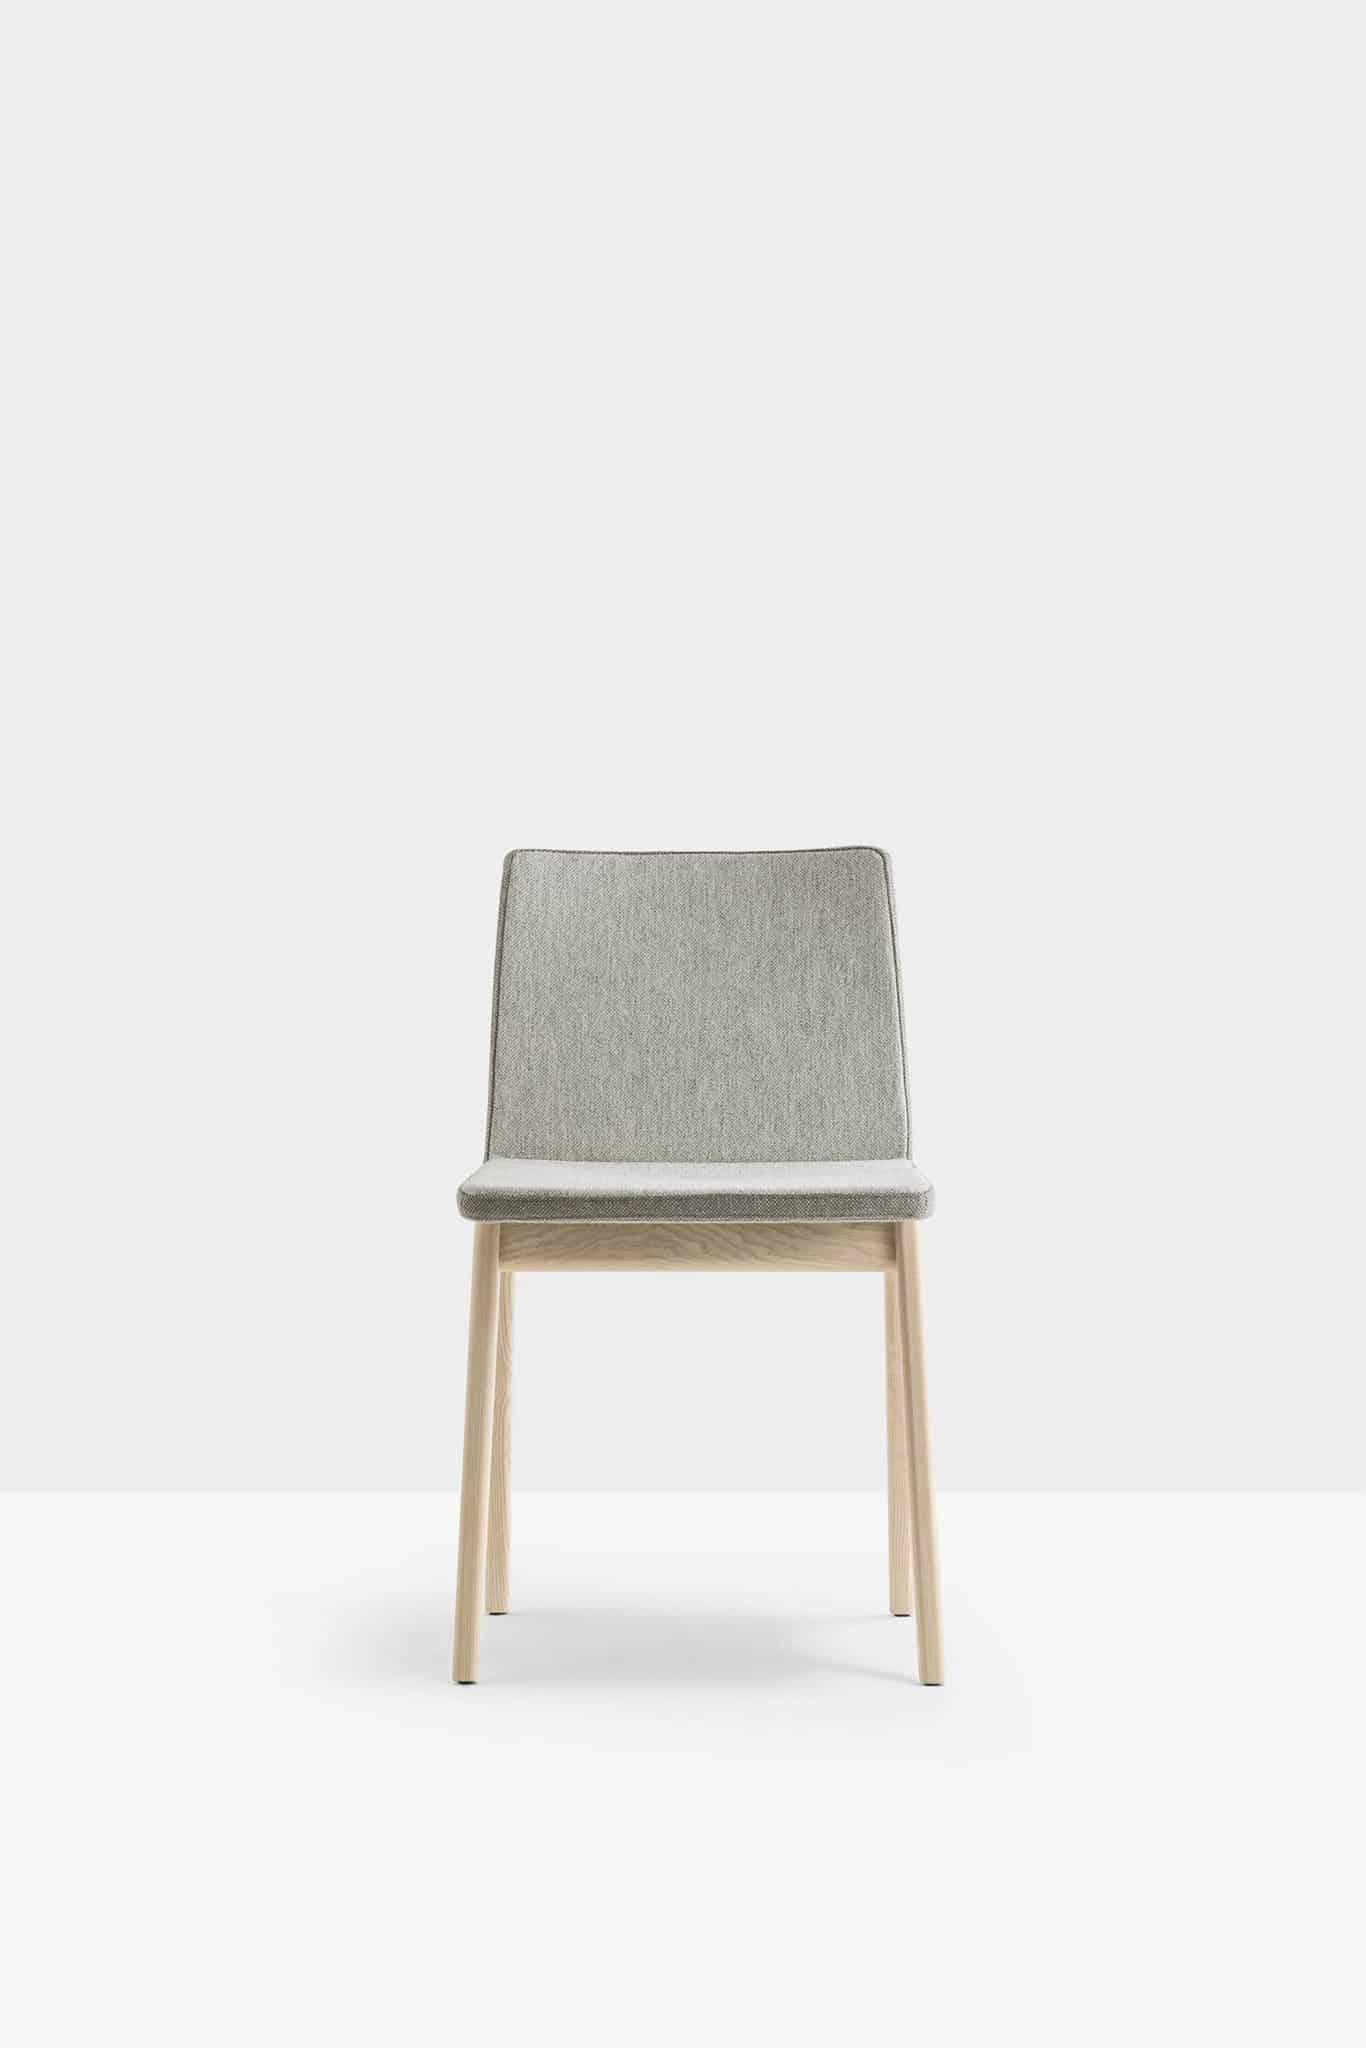 PEDRALI OSAKA 2811 chaise bois recouverte de tissu